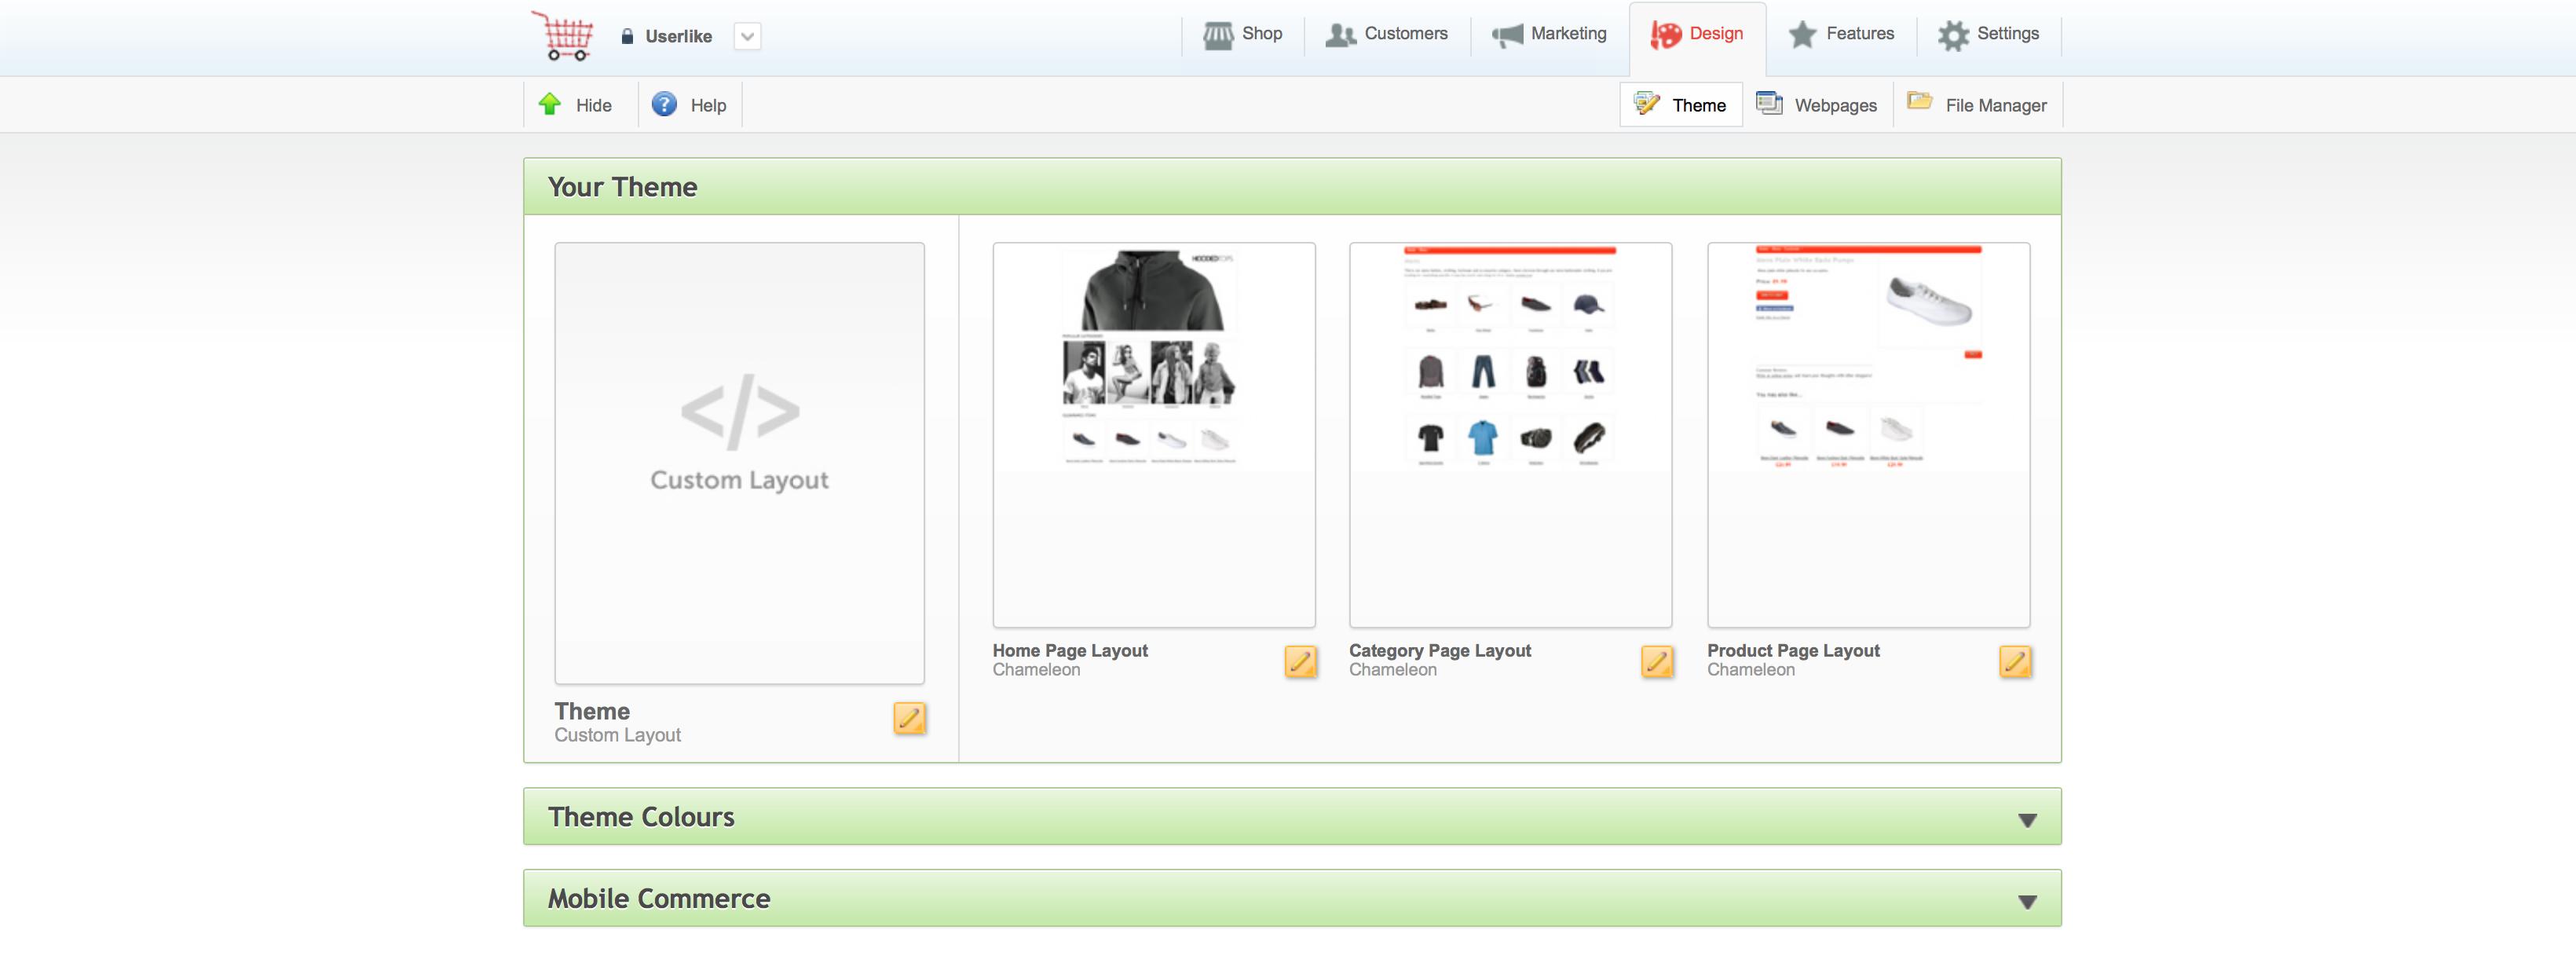 ekmPowershop screenshot: Design your online shop with ekmPowershop's drag and drop interface